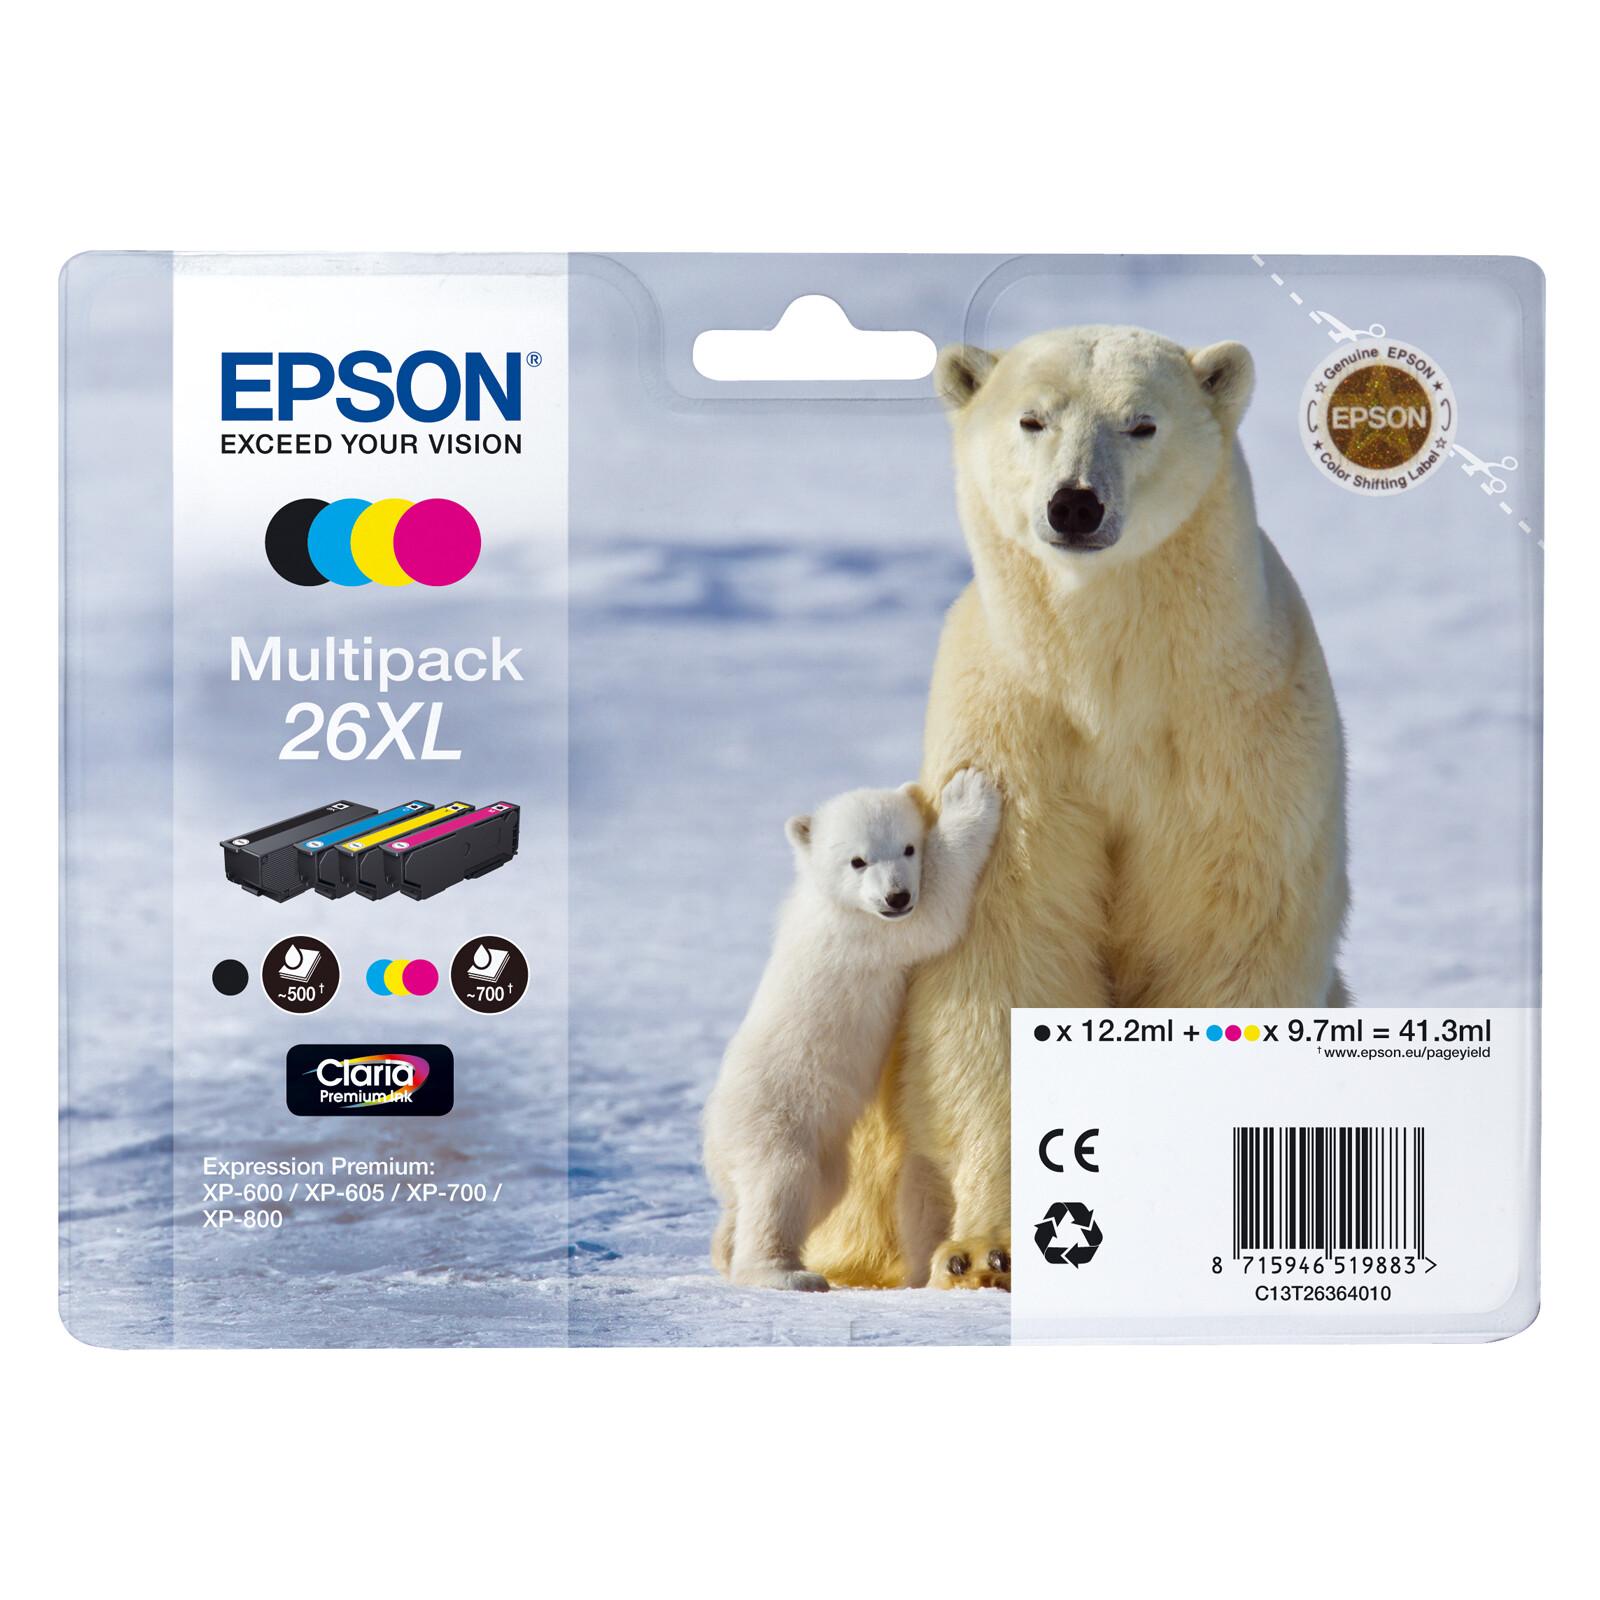 Epson 26XL T2636 Tinte Multipack